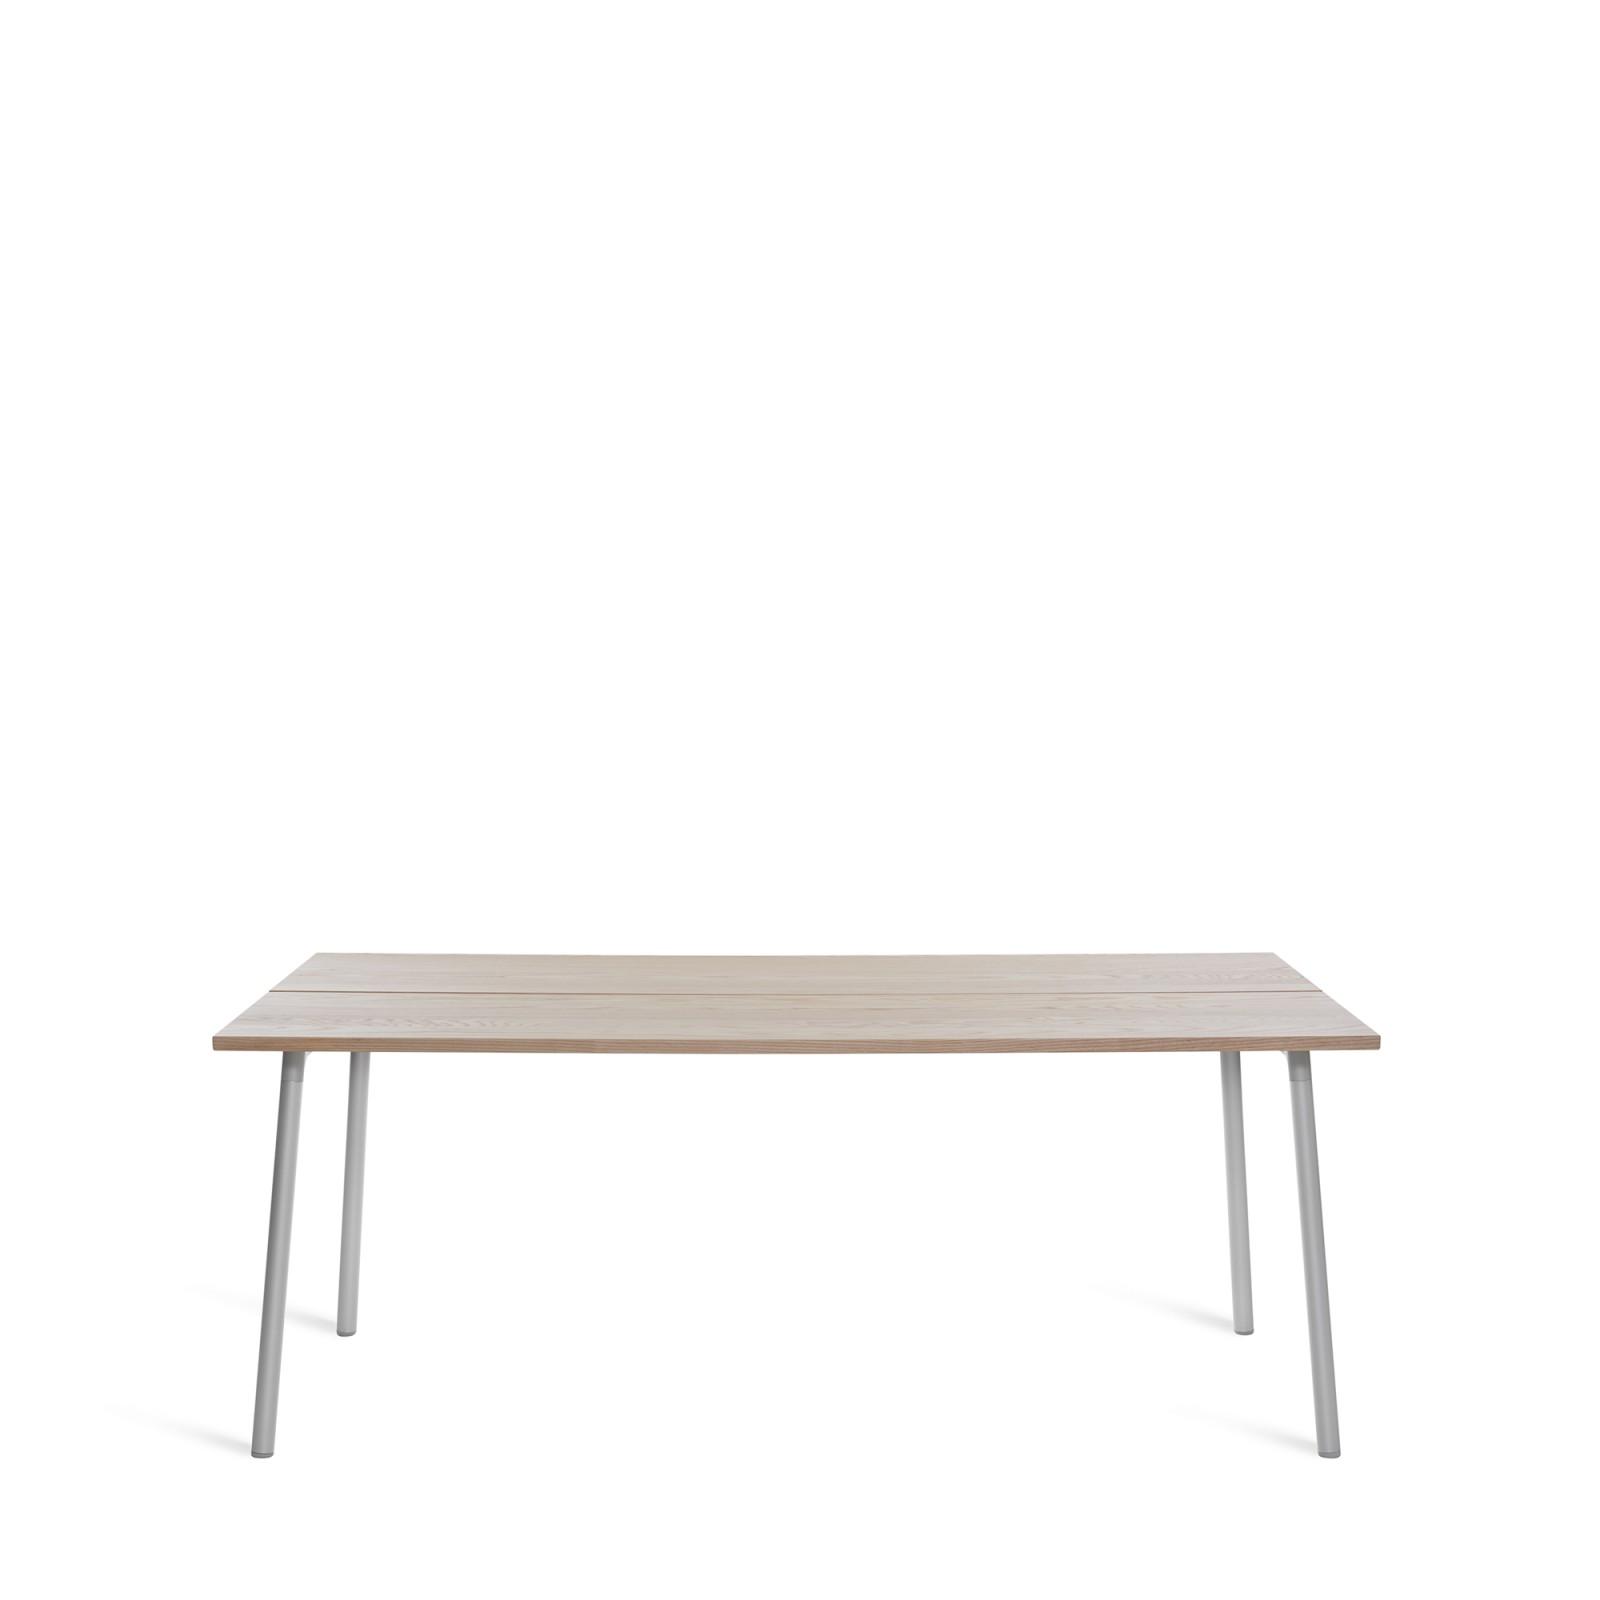 Run Dining Table Rectangular 183cm, Clear Aluminium, Ash